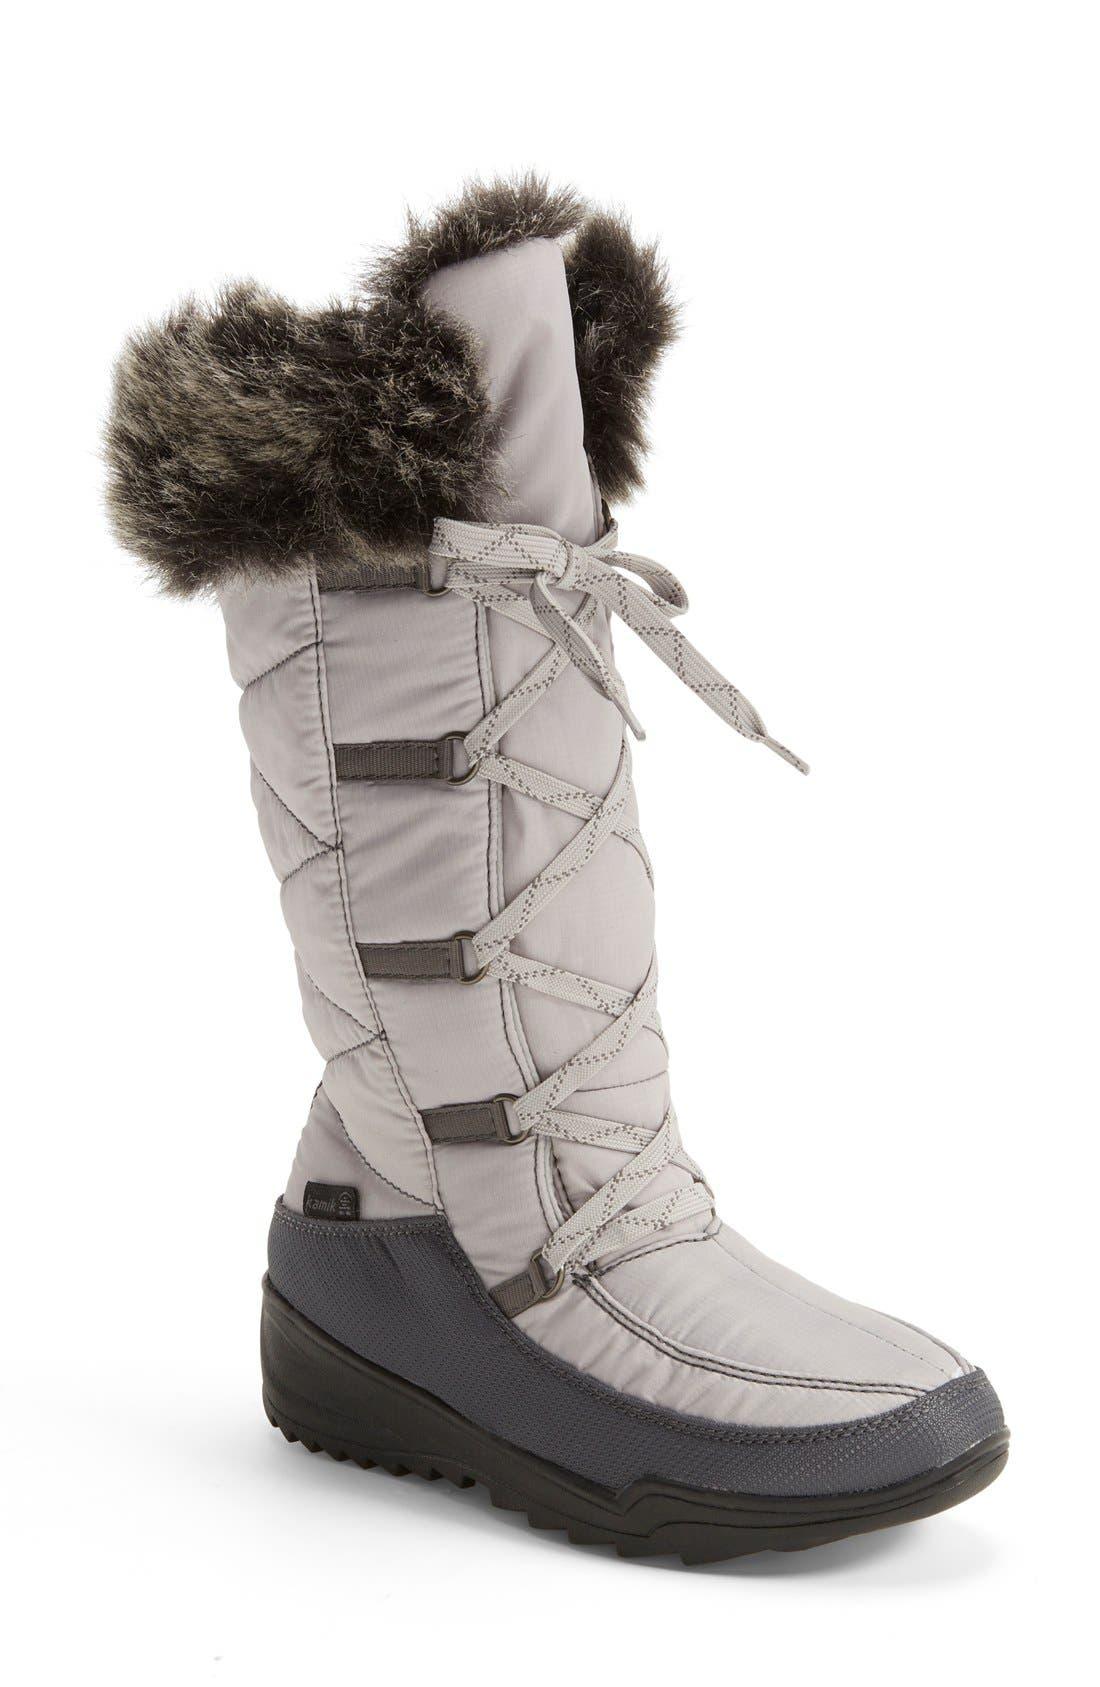 Alternate Image 1 Selected - Kamik 'Porto' Waterproof Winter Boot (Women)